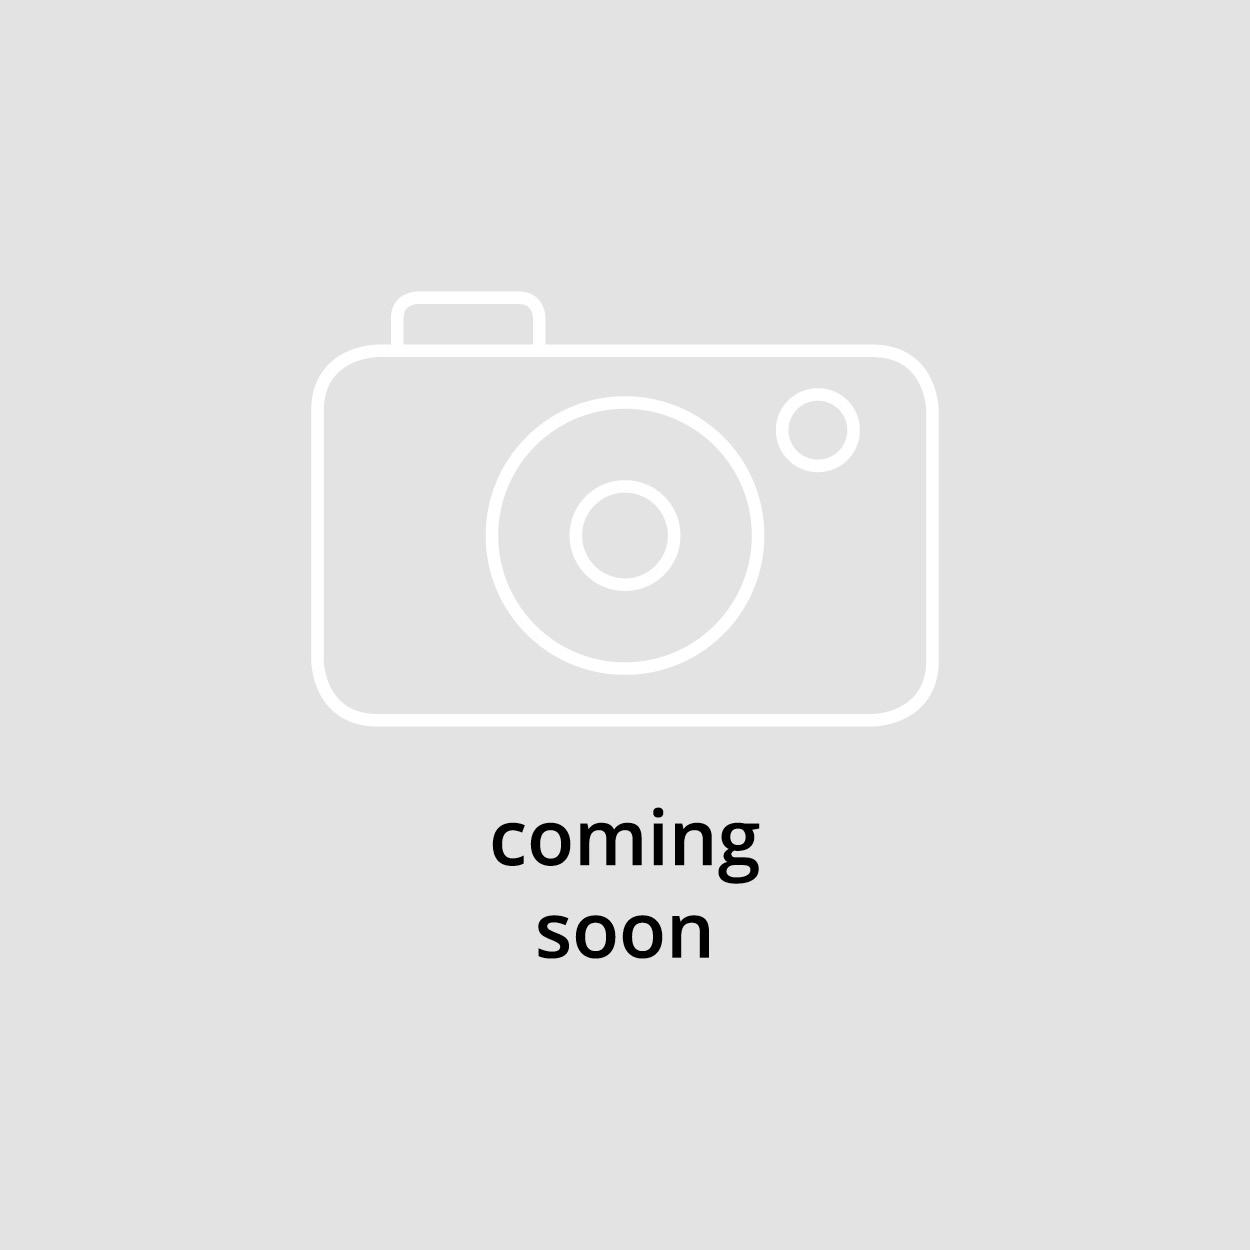 53.01.323 Tirante apertura chiusura pinza  per Gildemeister GM16AC